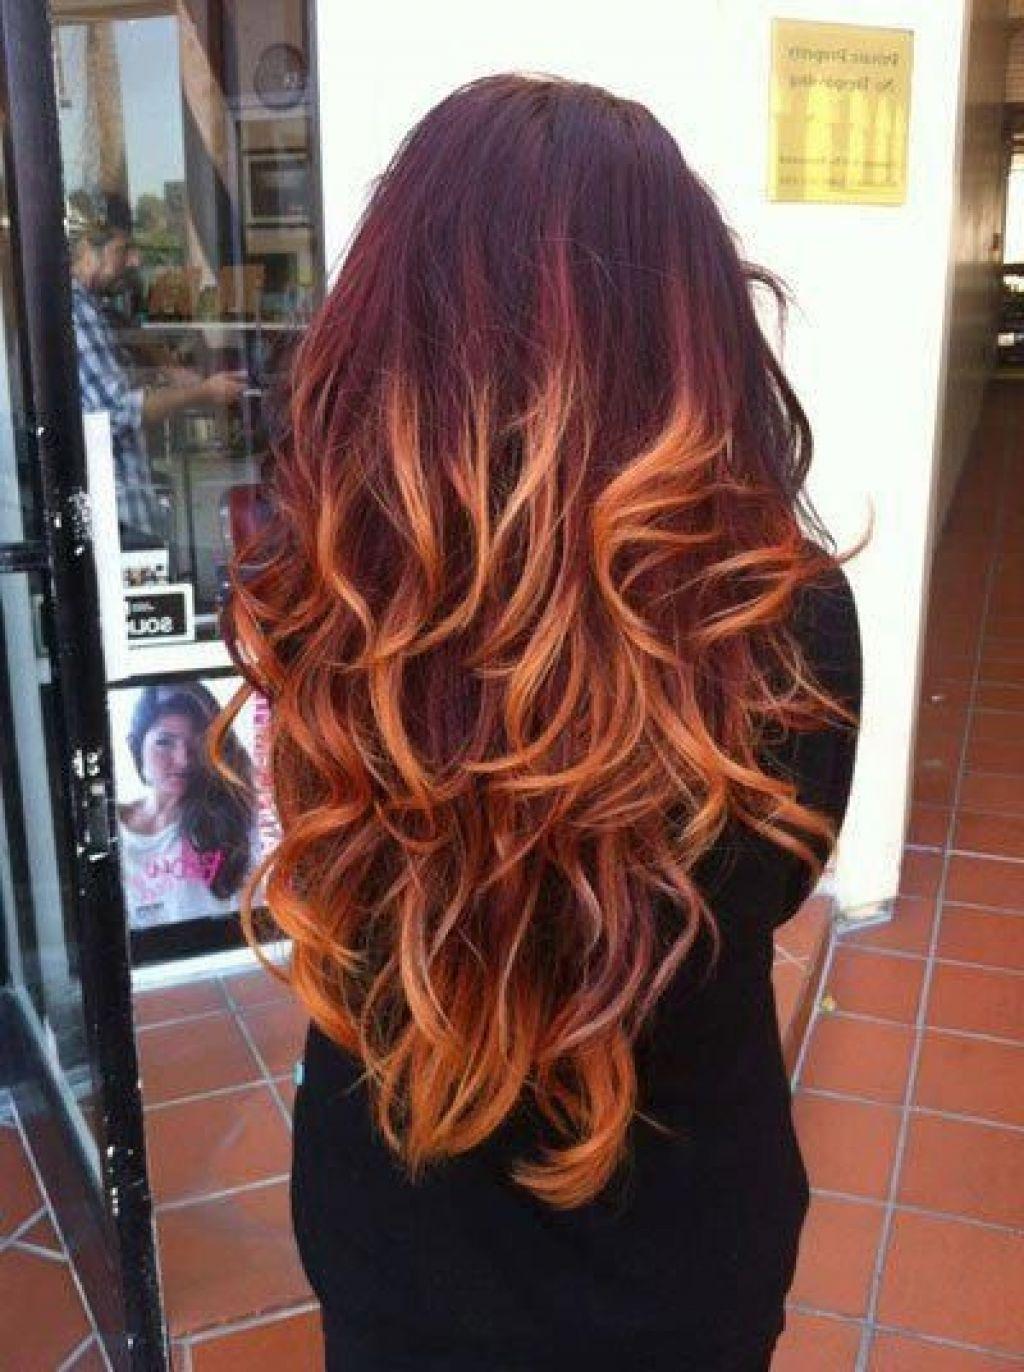 Redombrehaircolorddg hair dos